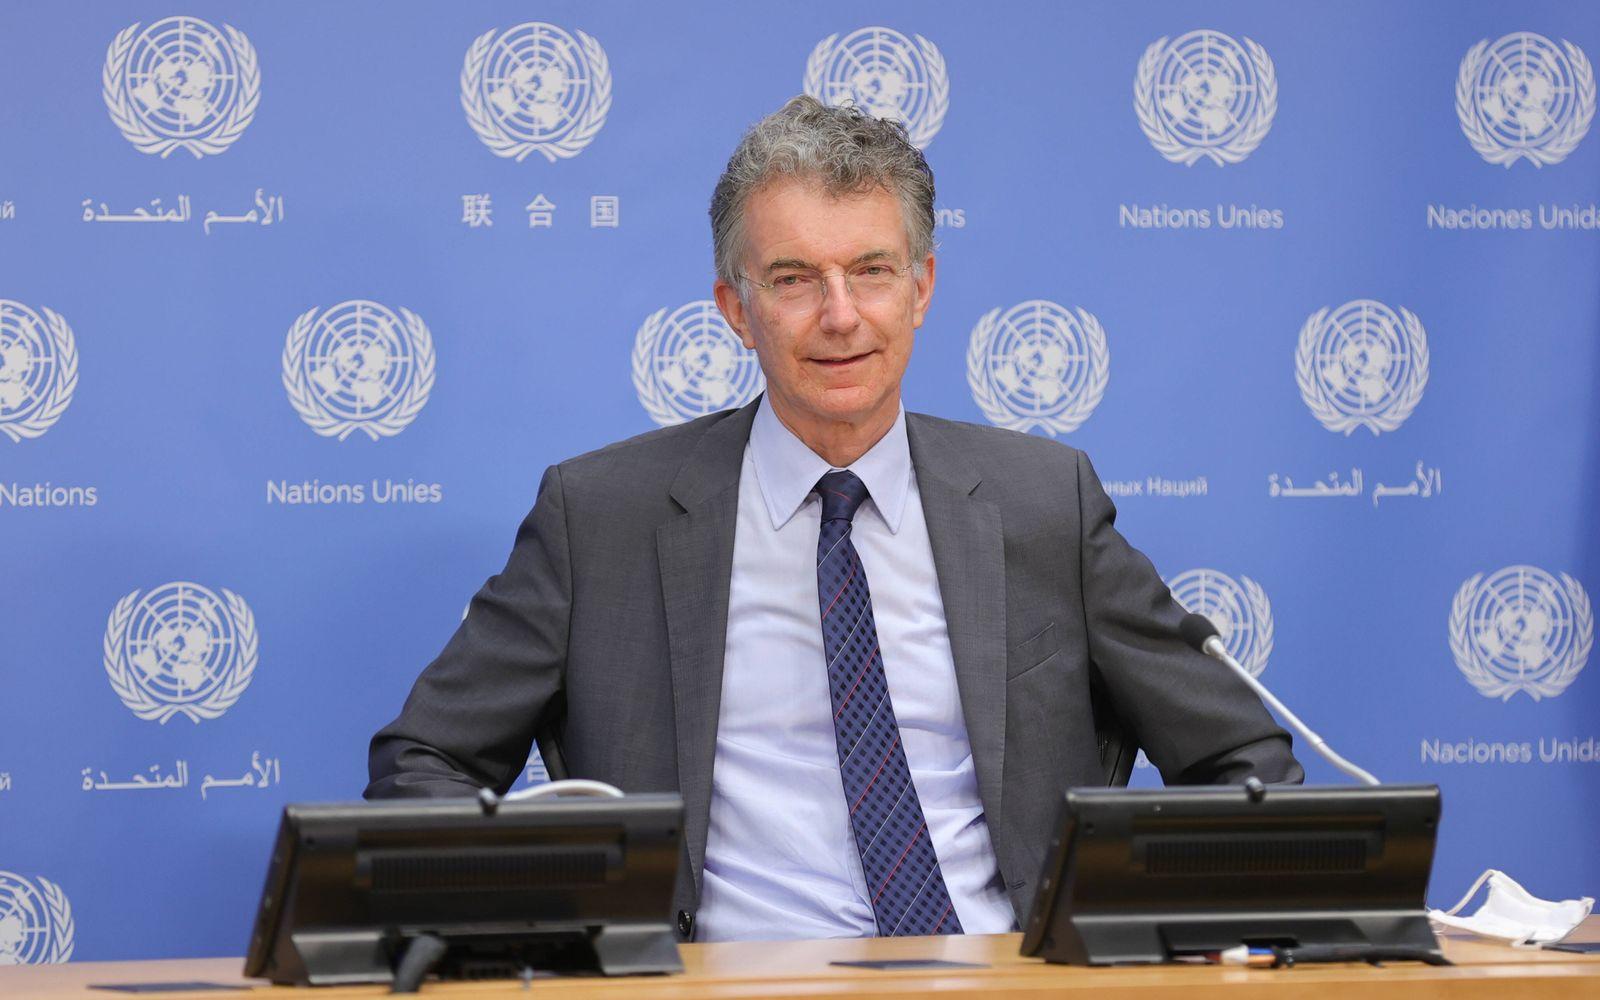 July 30, 2020, New York, NY, USA: United Nations, New York, USA, July 30, 2020 - Christoph Heusgen, Permanent Represent